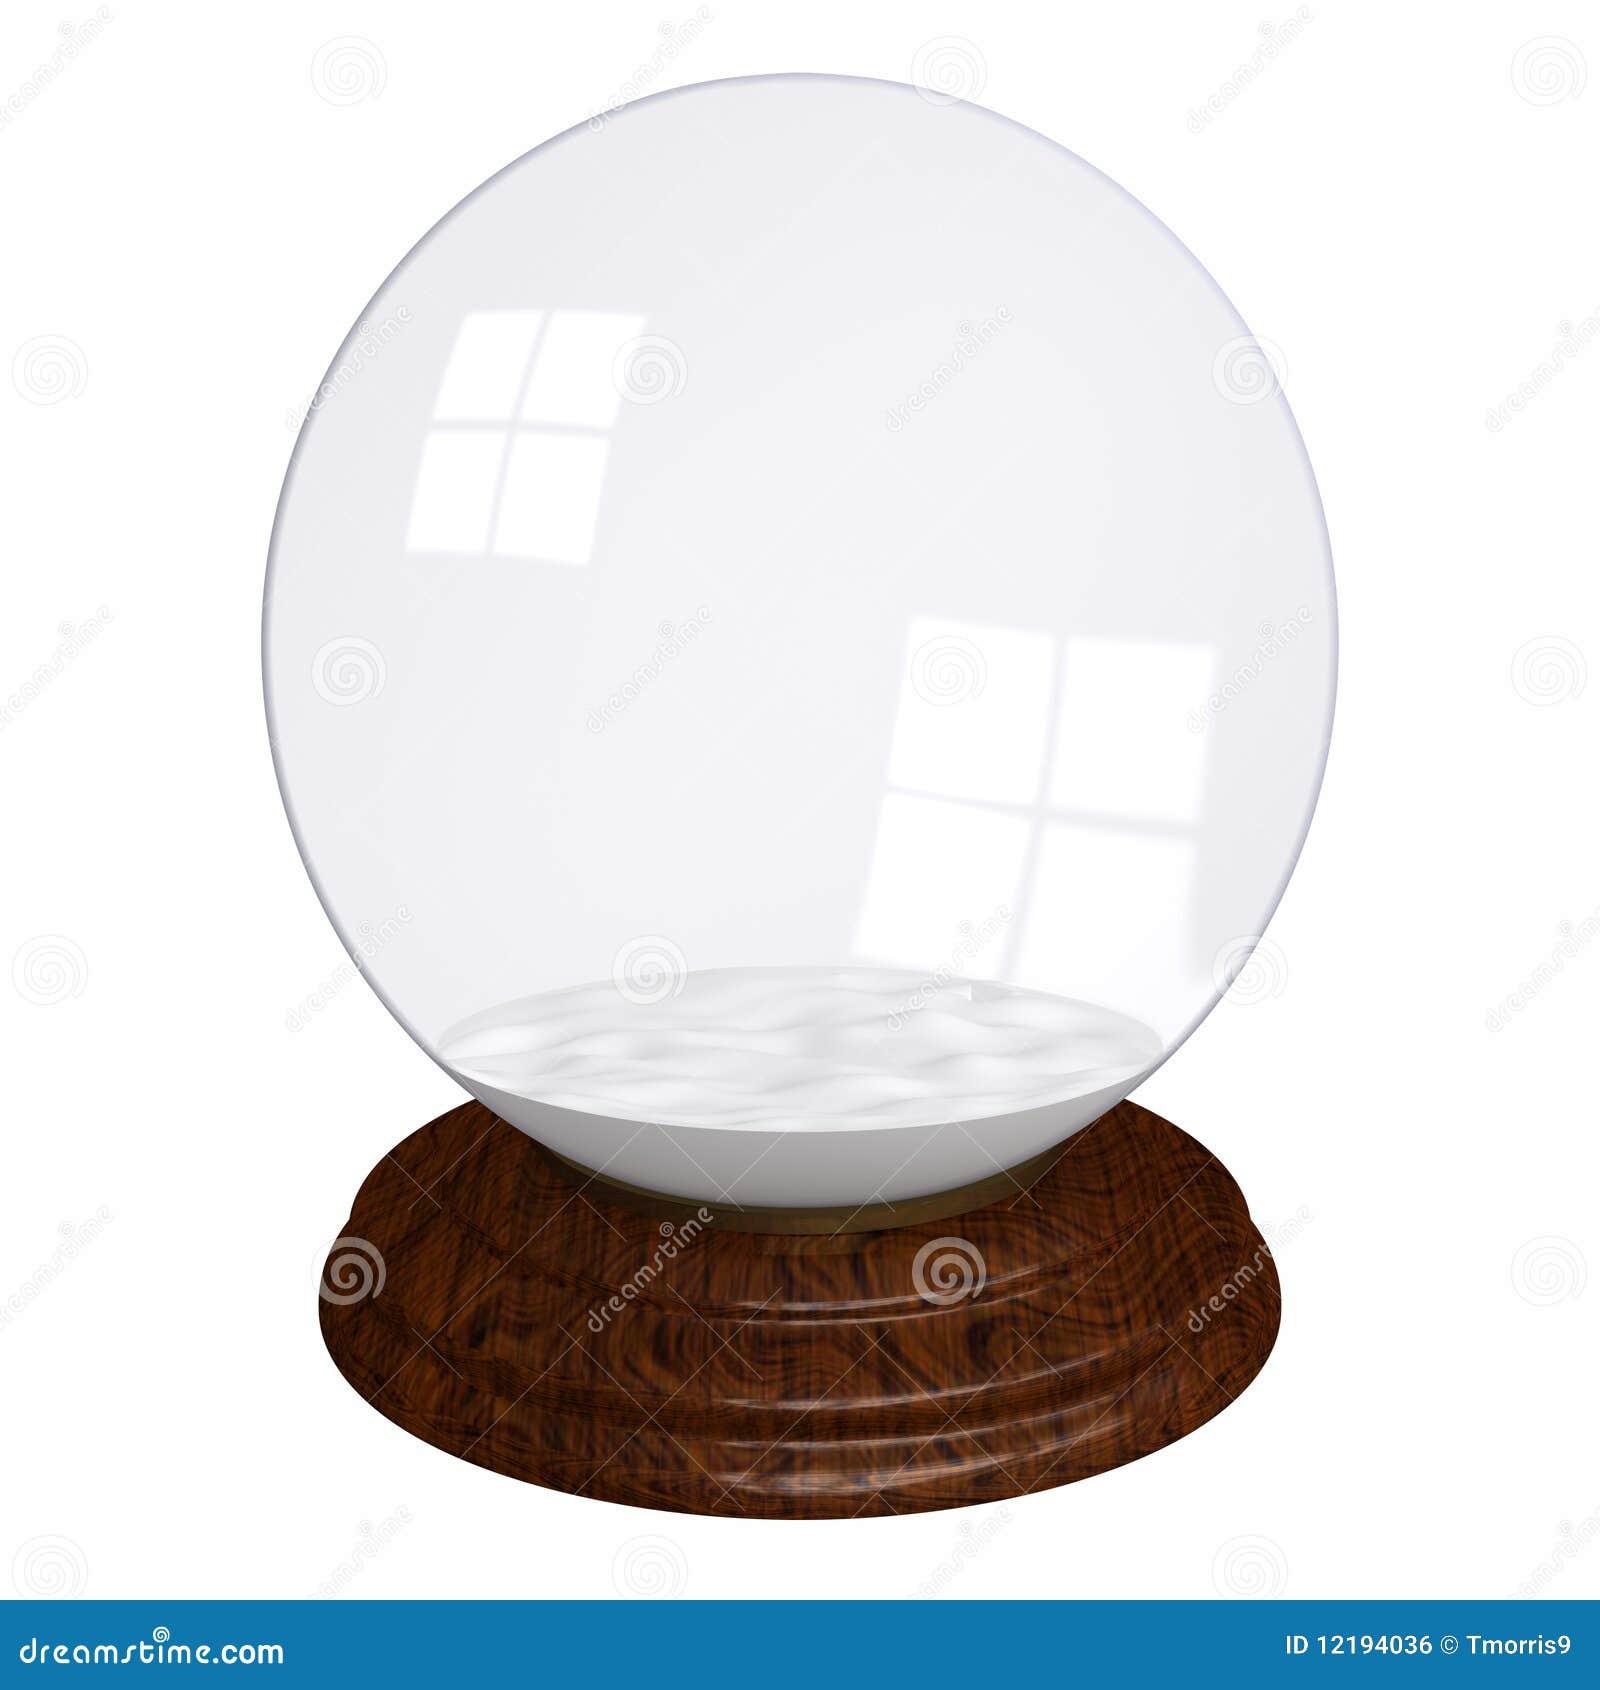 empty snow globe stock illustration image of isolated 12194036. Black Bedroom Furniture Sets. Home Design Ideas